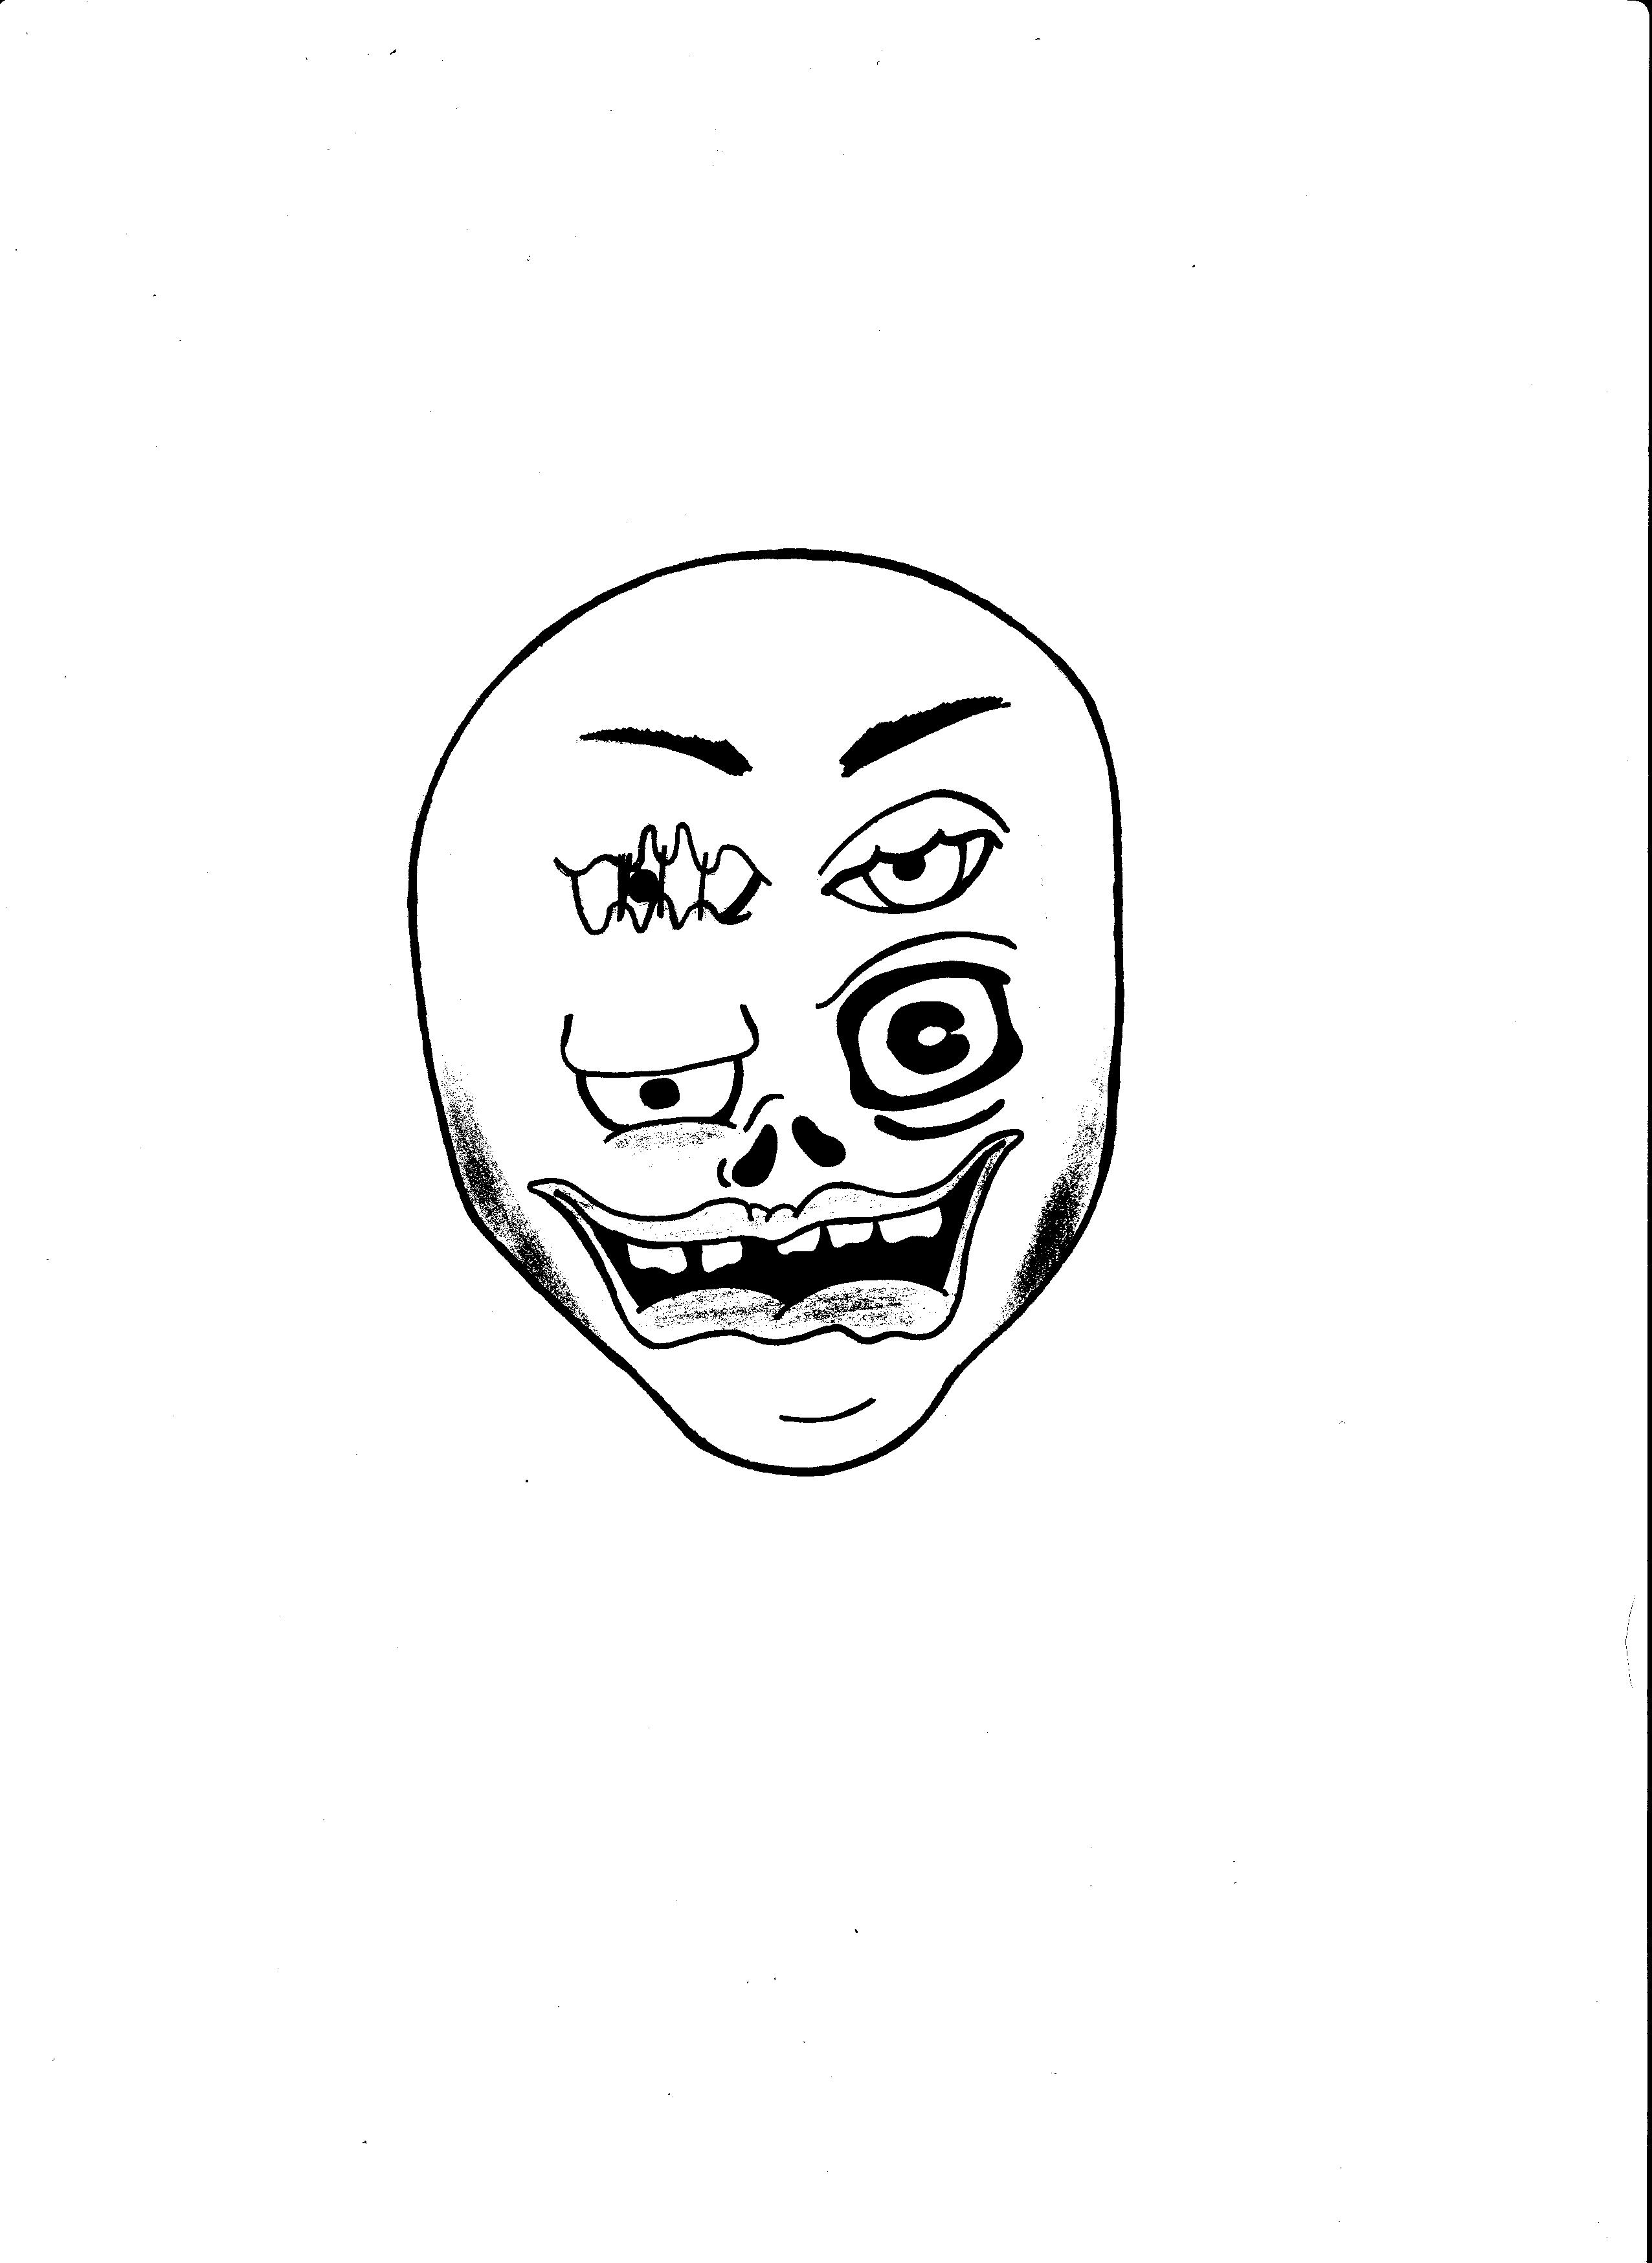 Head full of joy